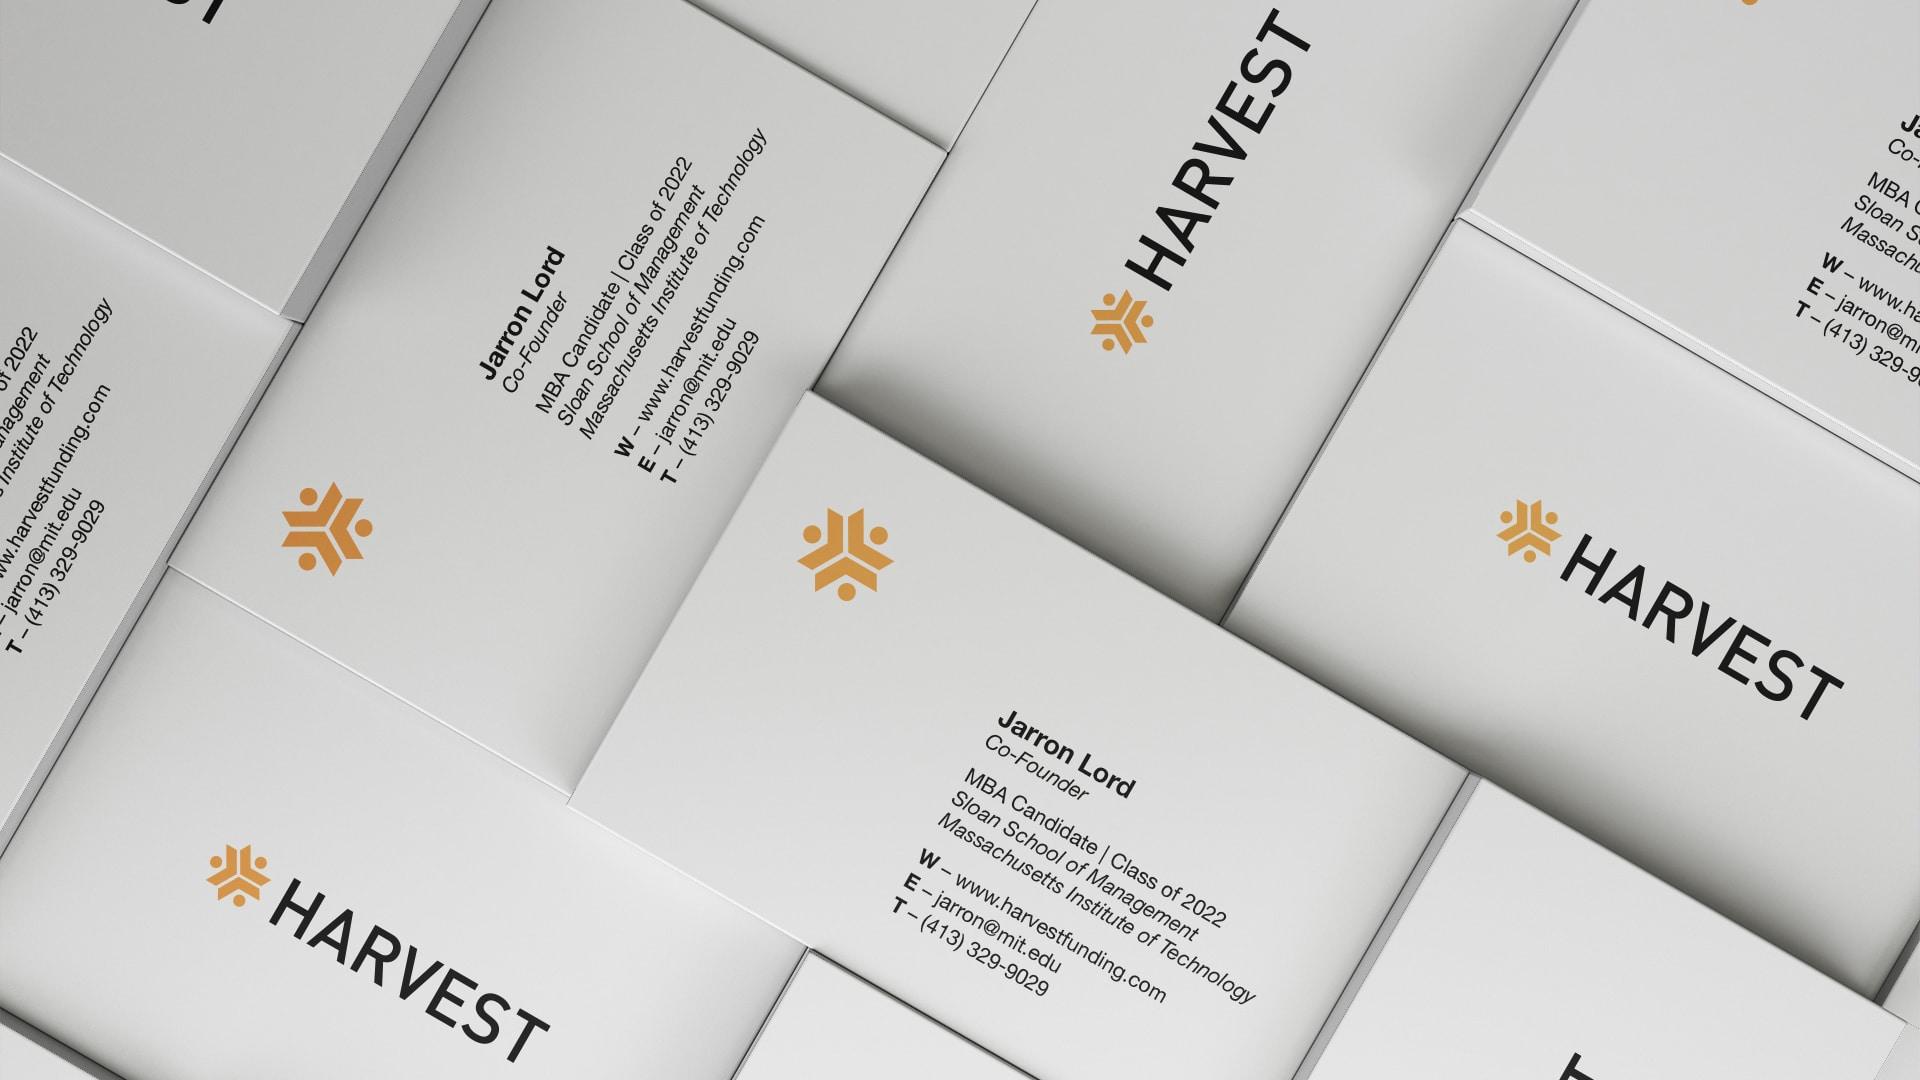 fitosophy-mit100k-harvest3